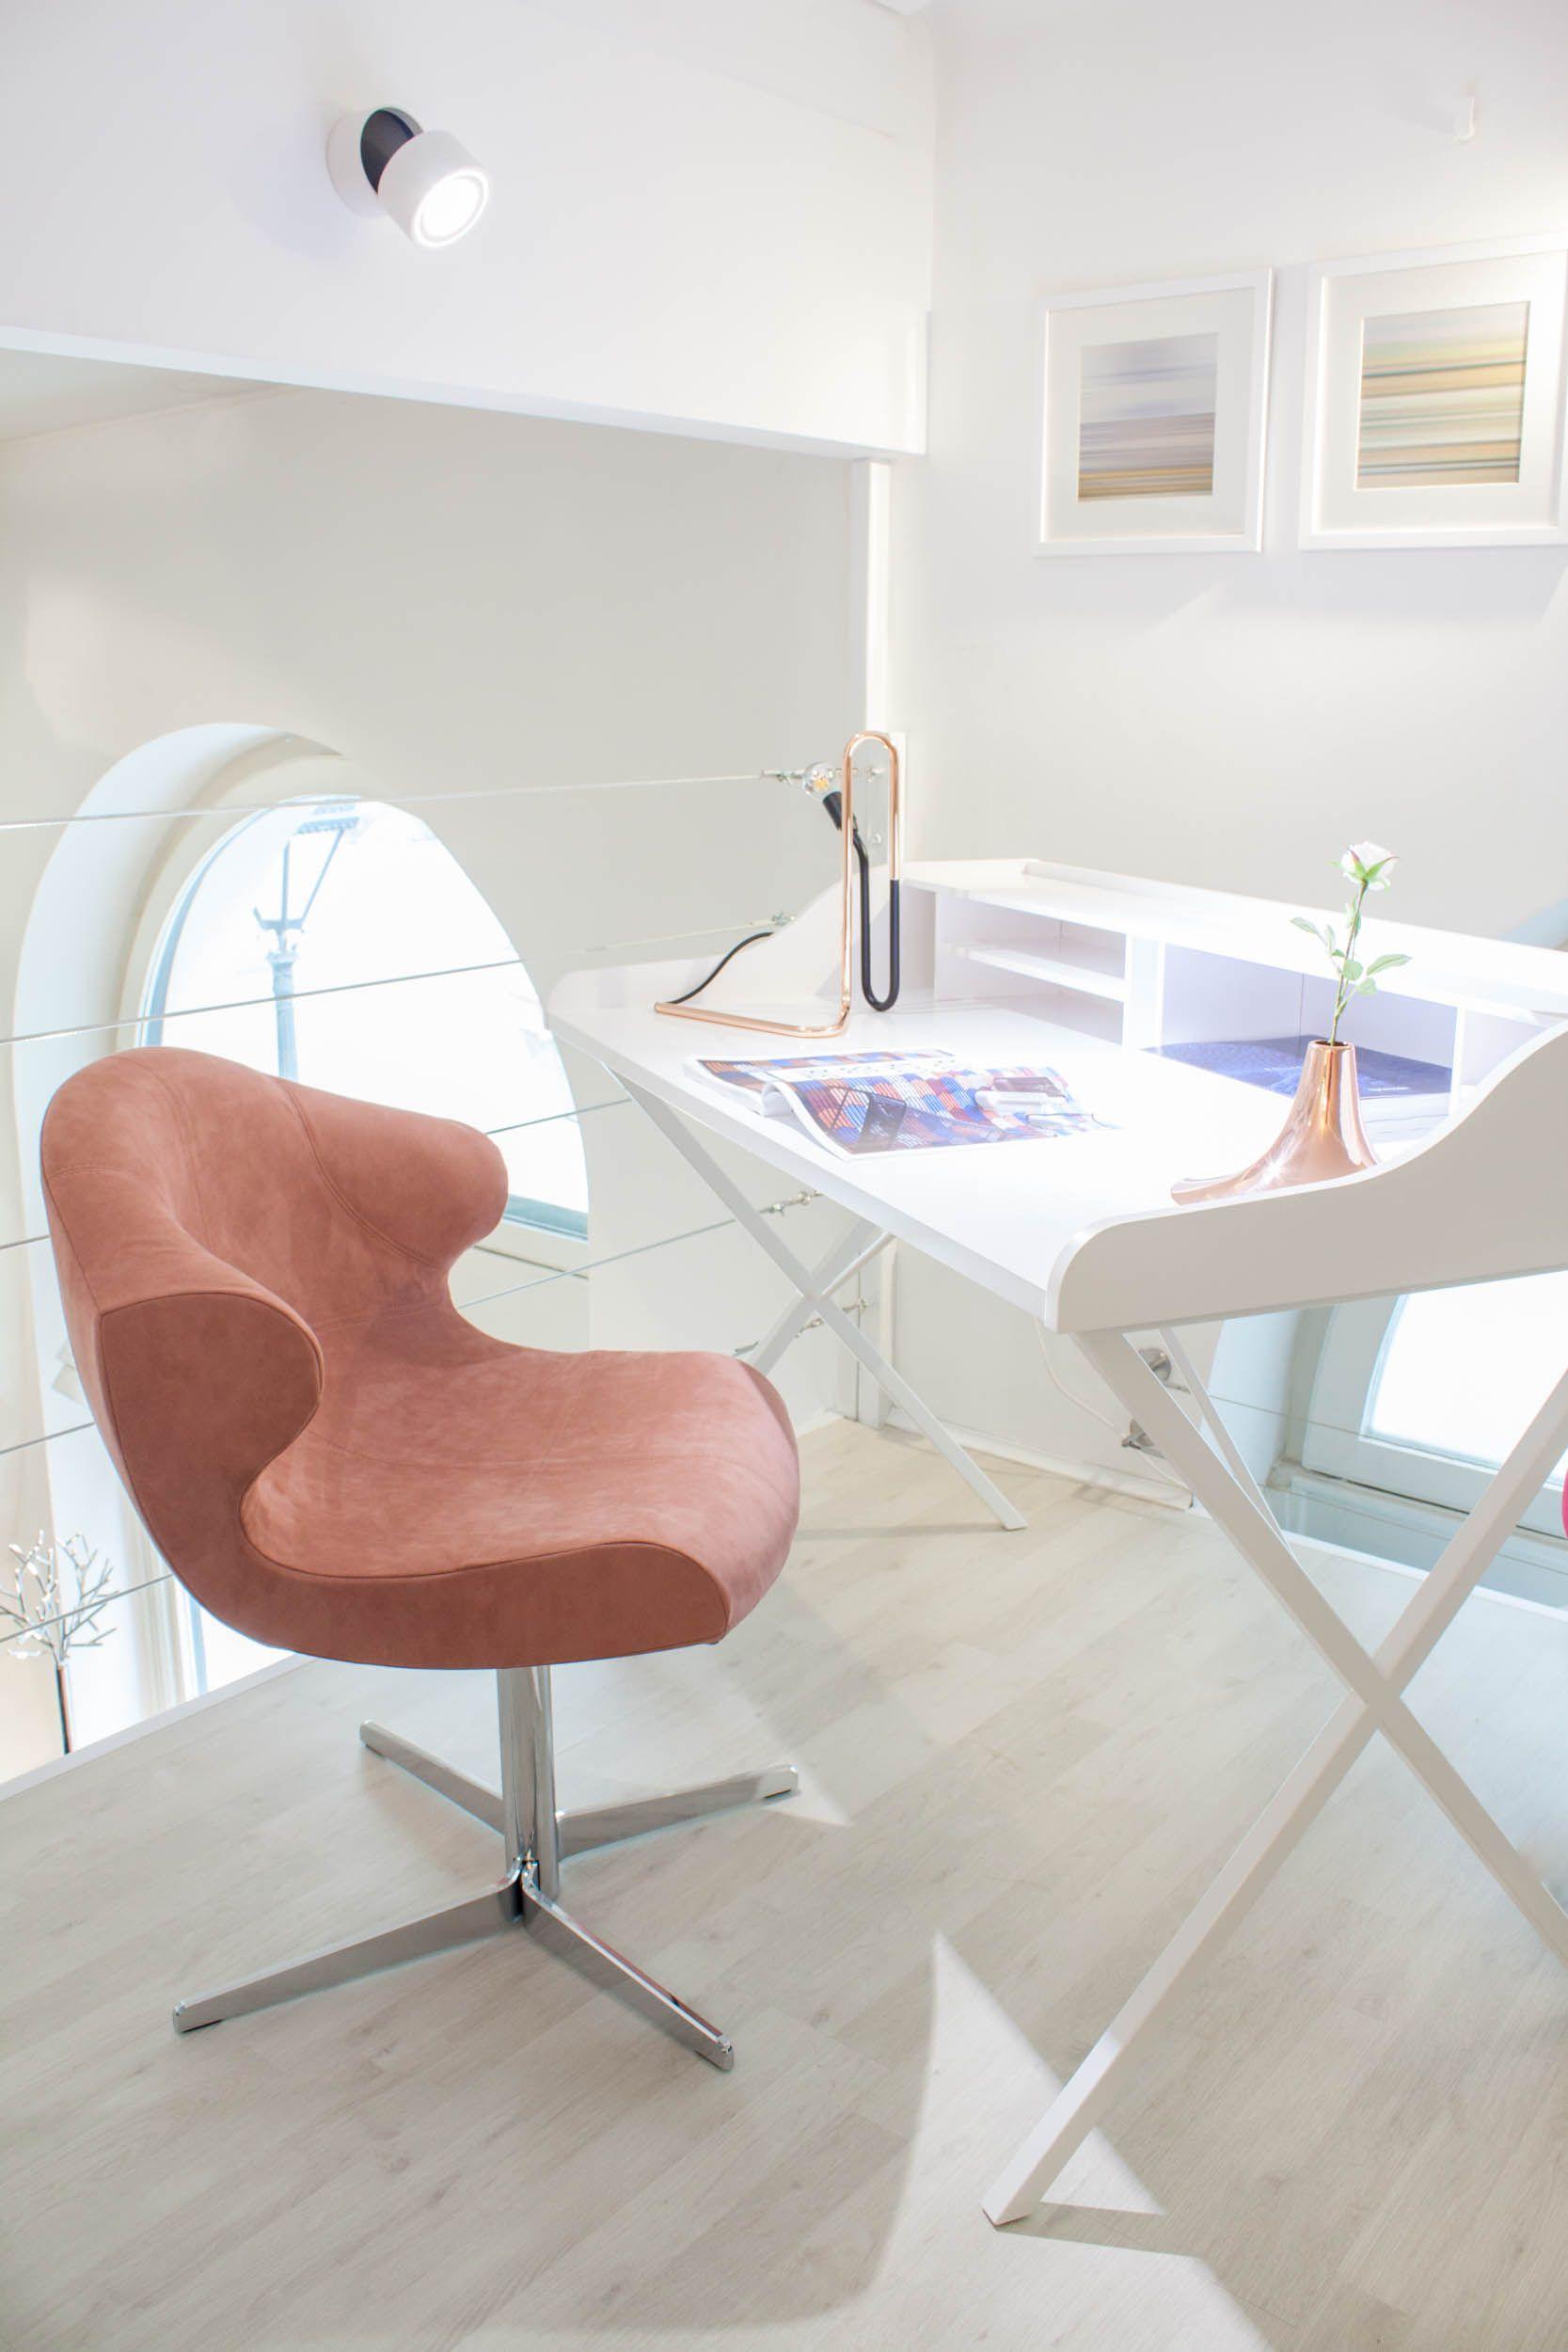 fauteuil pierre paulin ligne roset elegant ligne roset. Black Bedroom Furniture Sets. Home Design Ideas